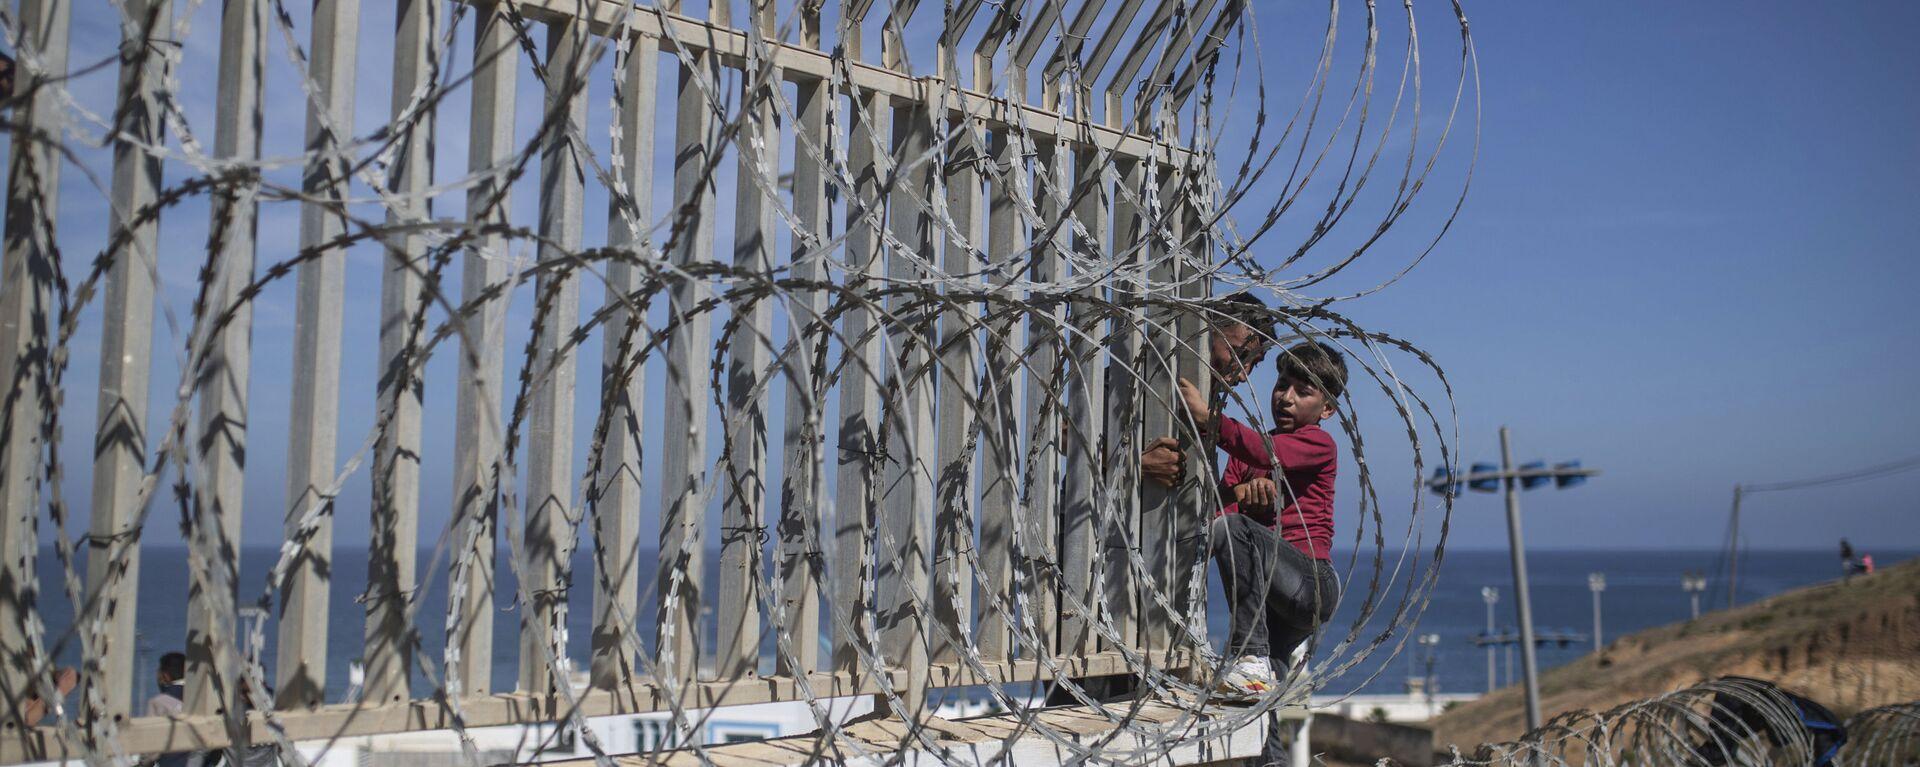 Мигранты перелезают через забор на границе Марокко и Испании, недалеко от испанского анклава Сеута - Sputnik Узбекистан, 1920, 24.07.2021